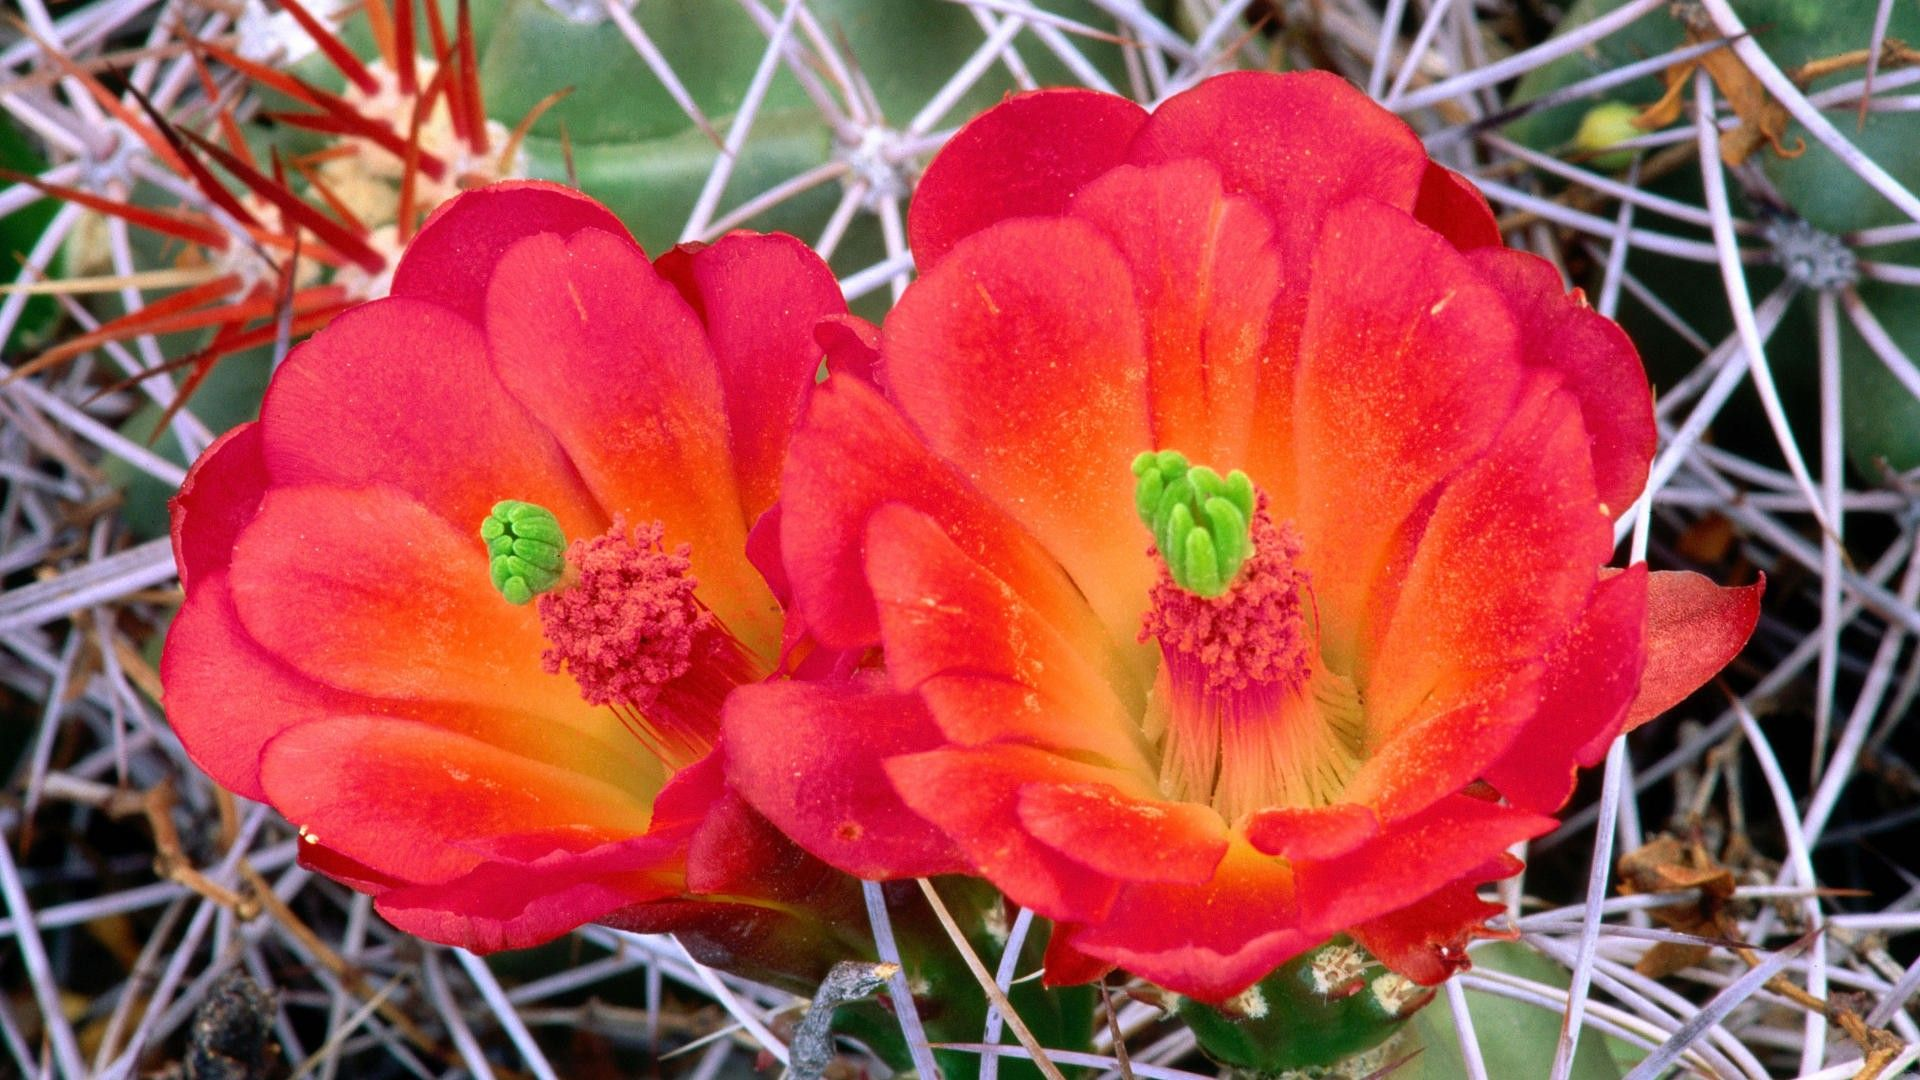 cactus-macro-cactus-flowers-fresh-new-hd-wallpaper.jpg (1920×1080 ...